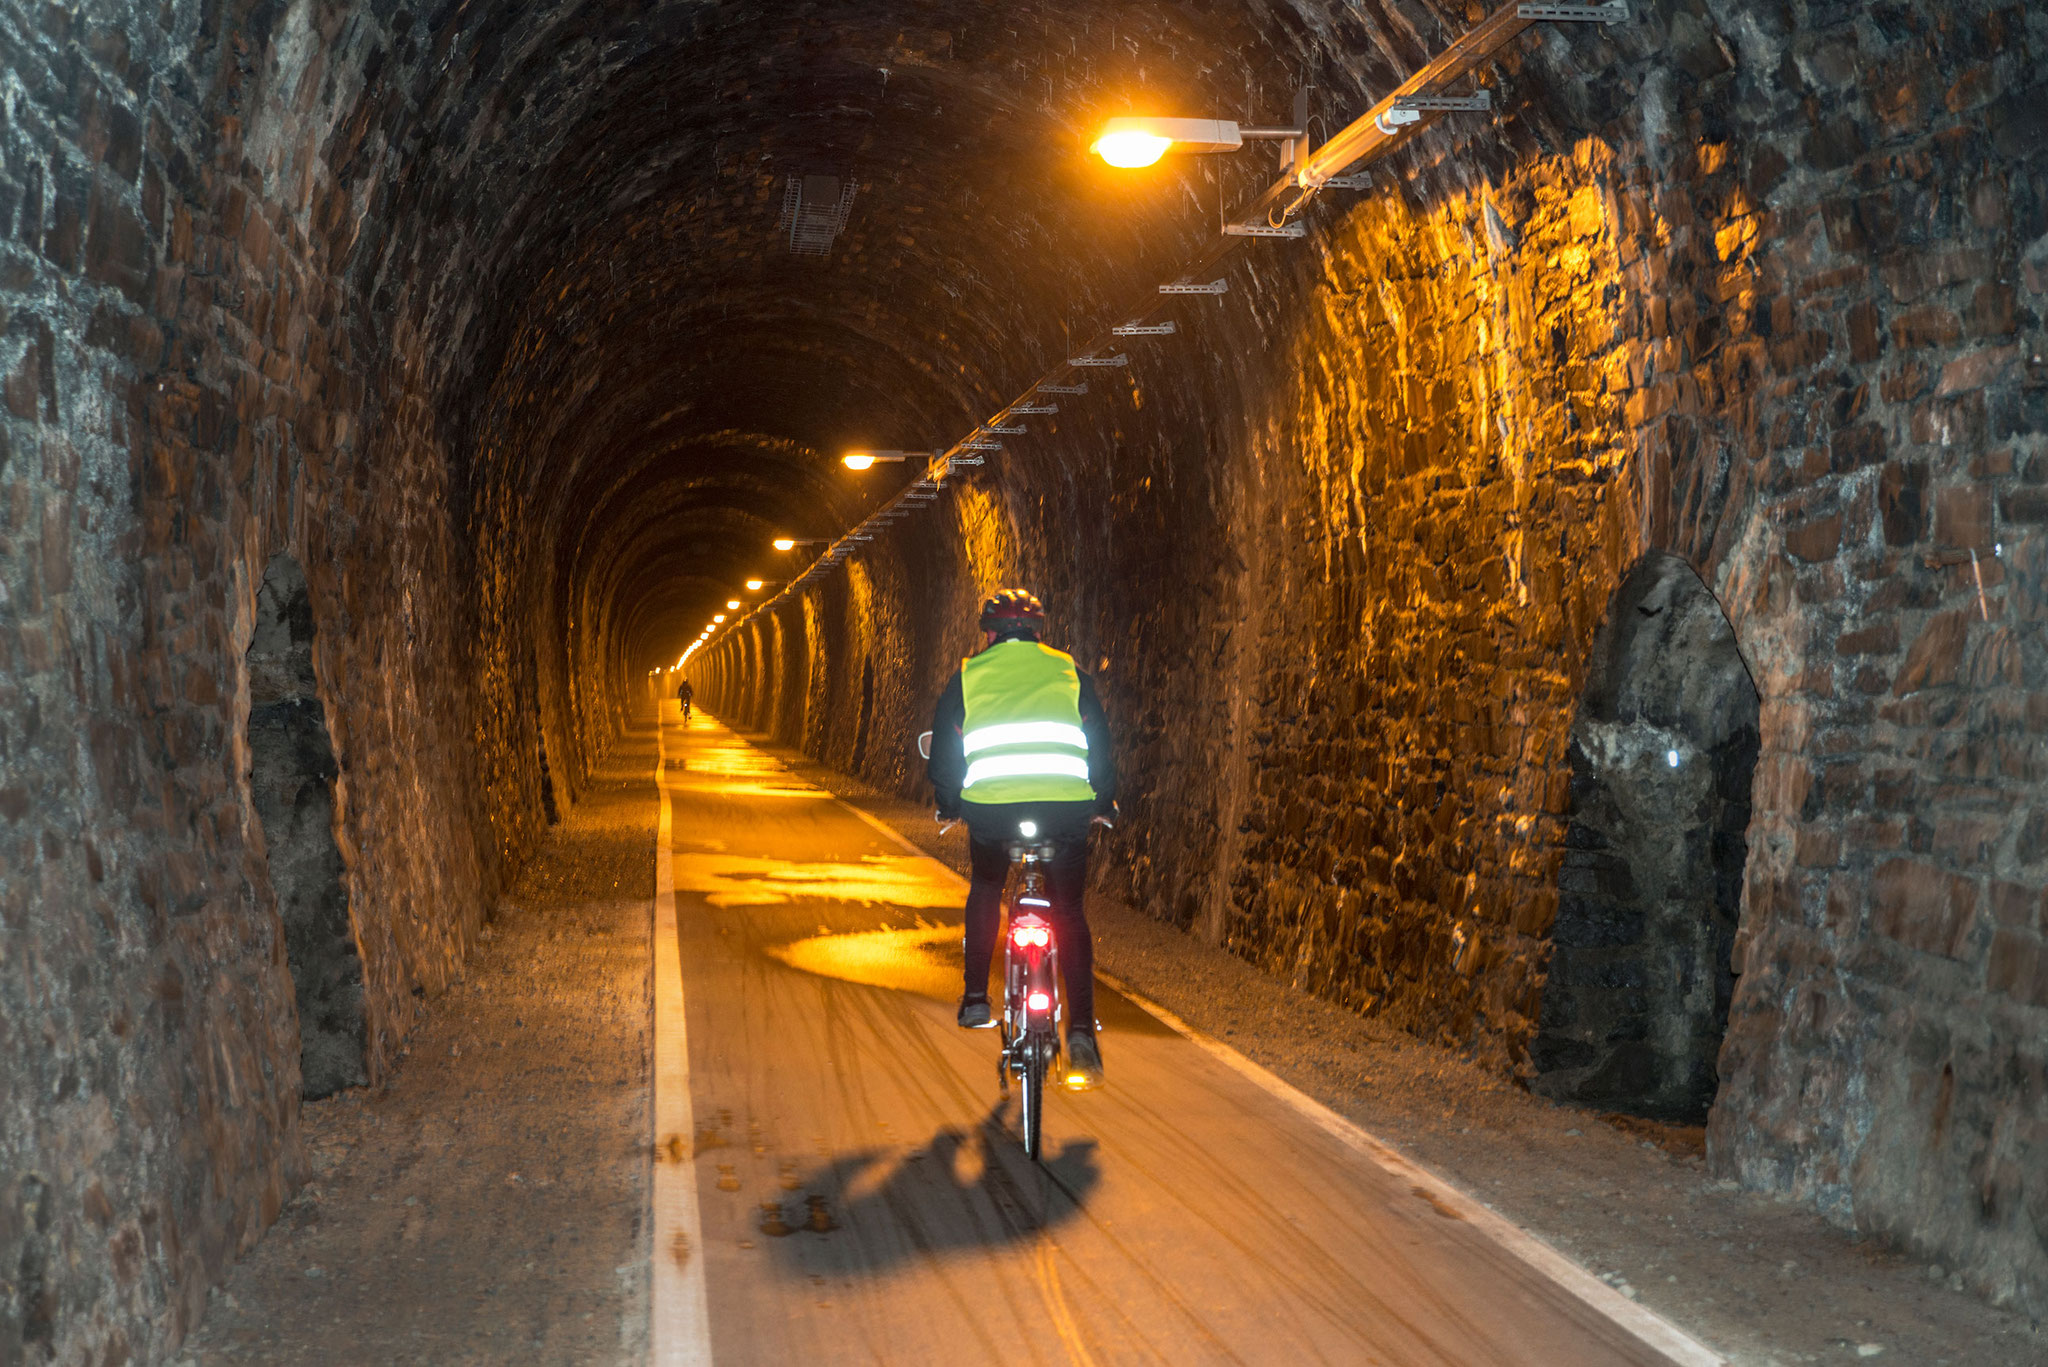 Sauerland, Kückelheimer Tunnel, Alleenradweg